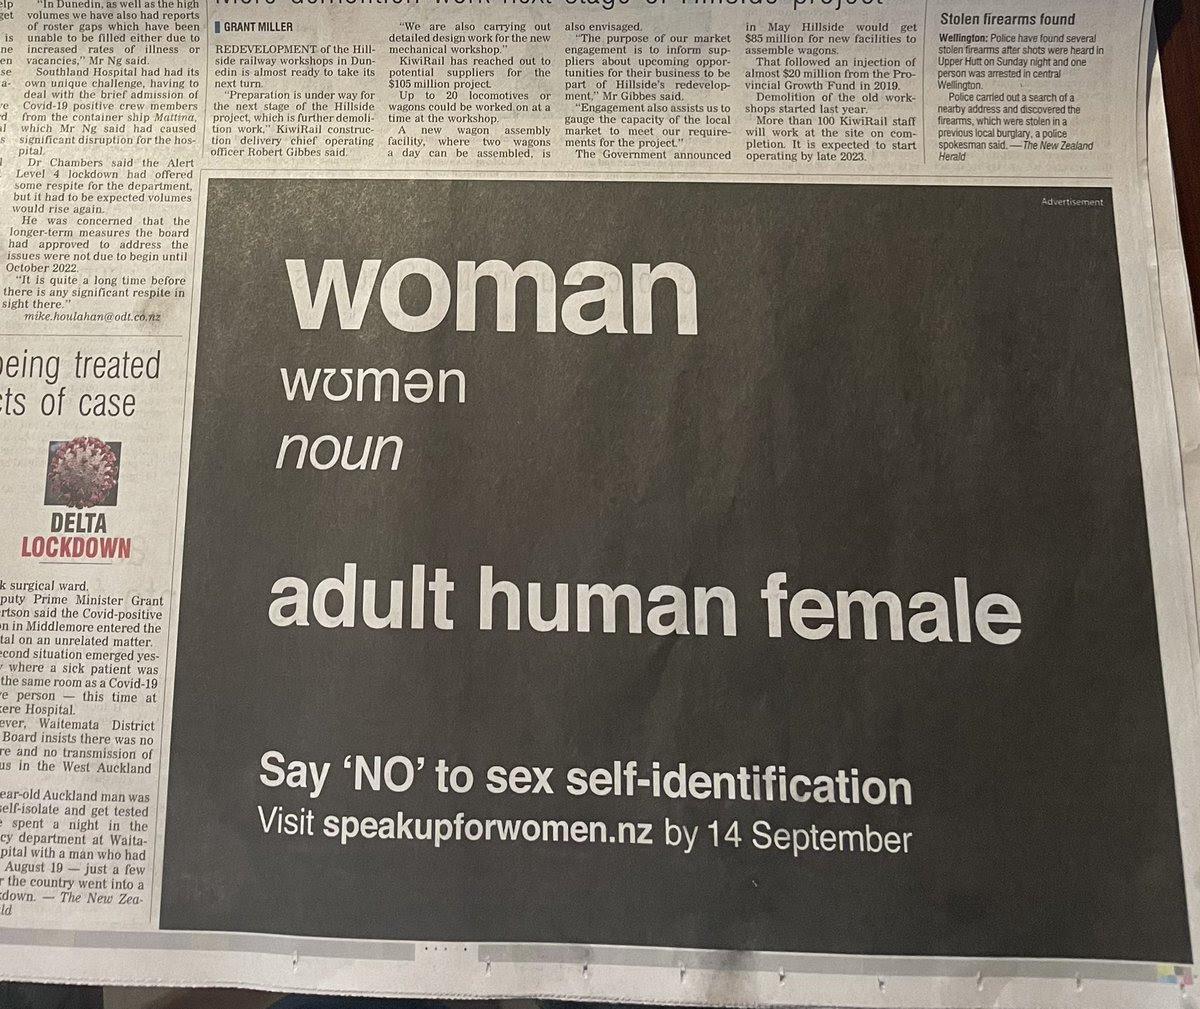 Speak Up For Women ODT Advert